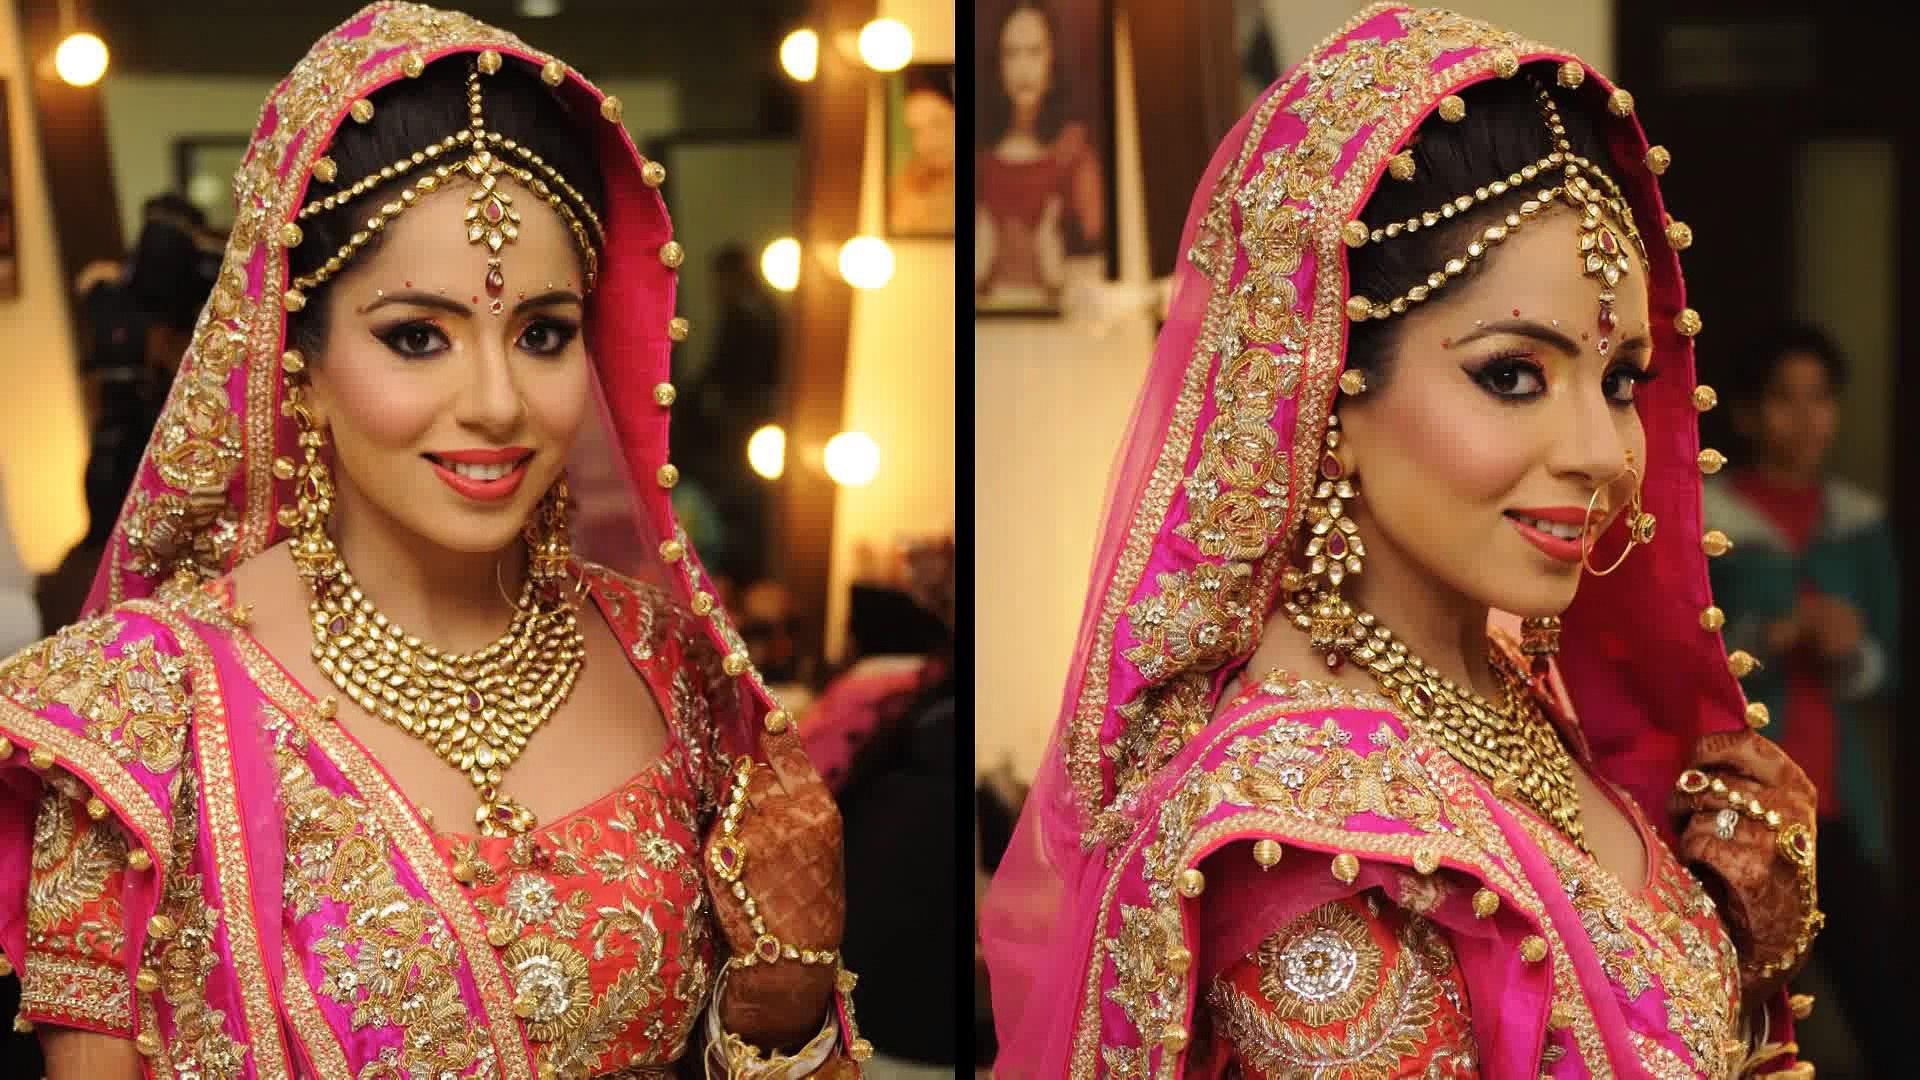 Traditional Bridal Makeup With Peach and Pink-Pakistani Bridal Makeup 2016